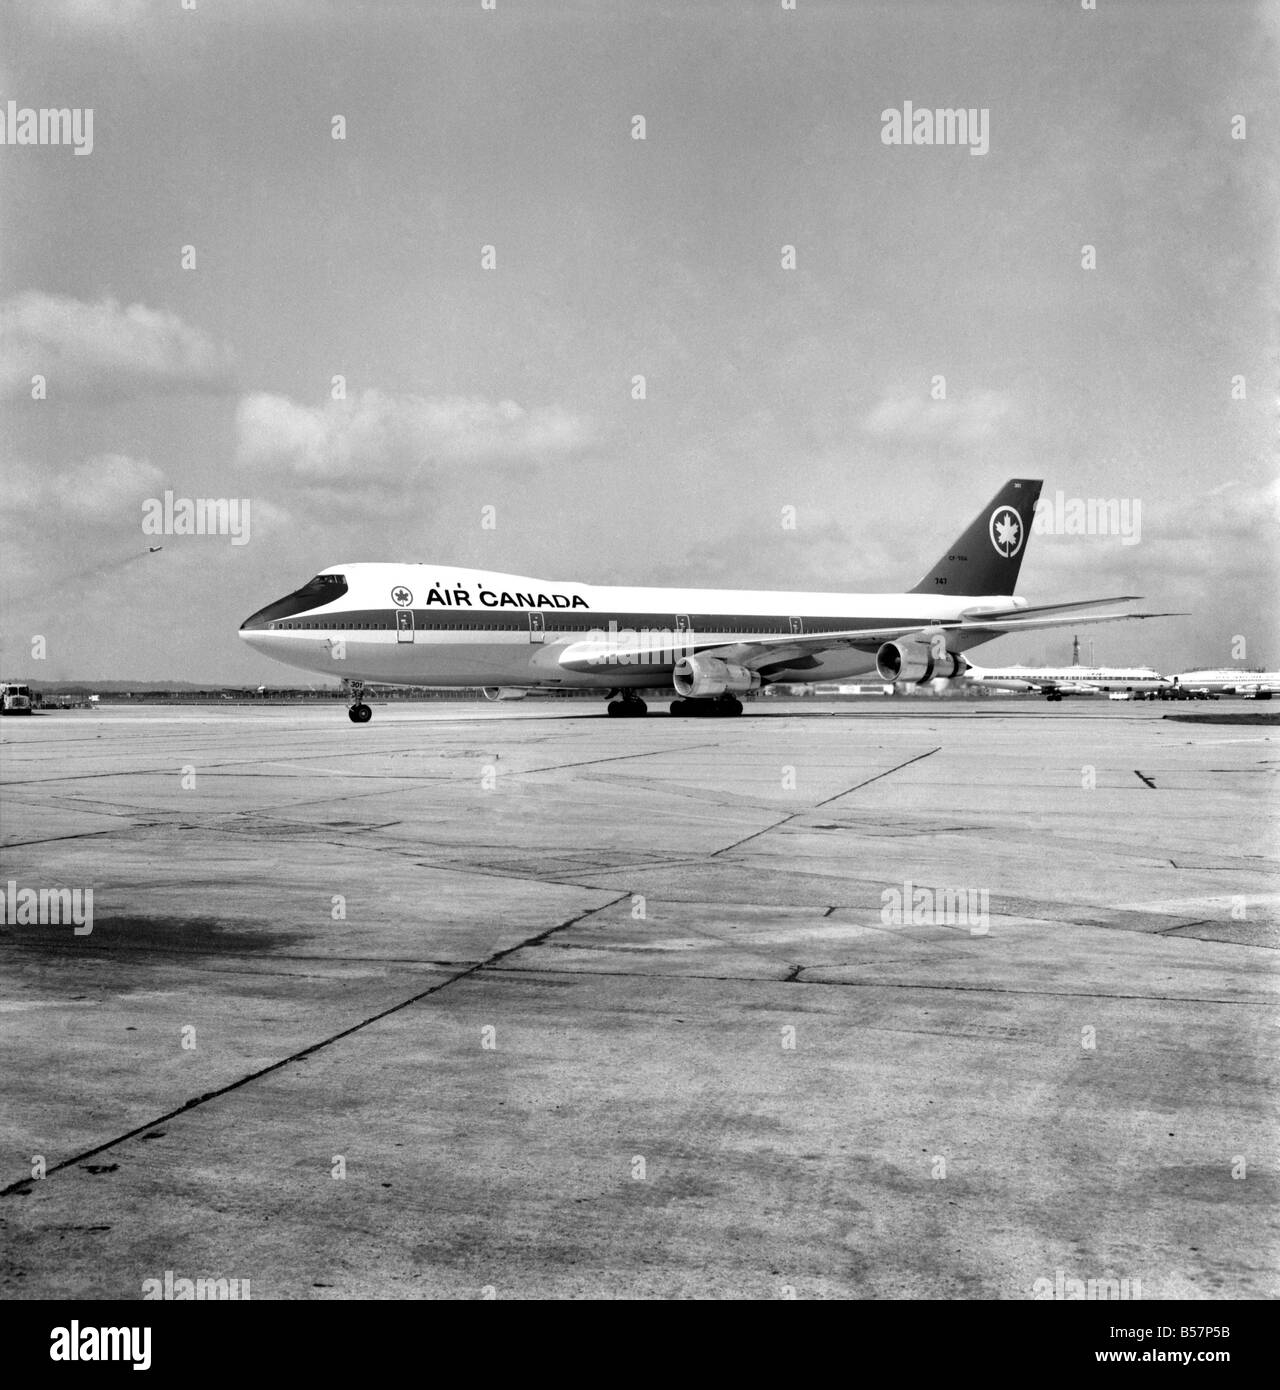 Jumbo Jet Black And White Stock Photos Amp Images